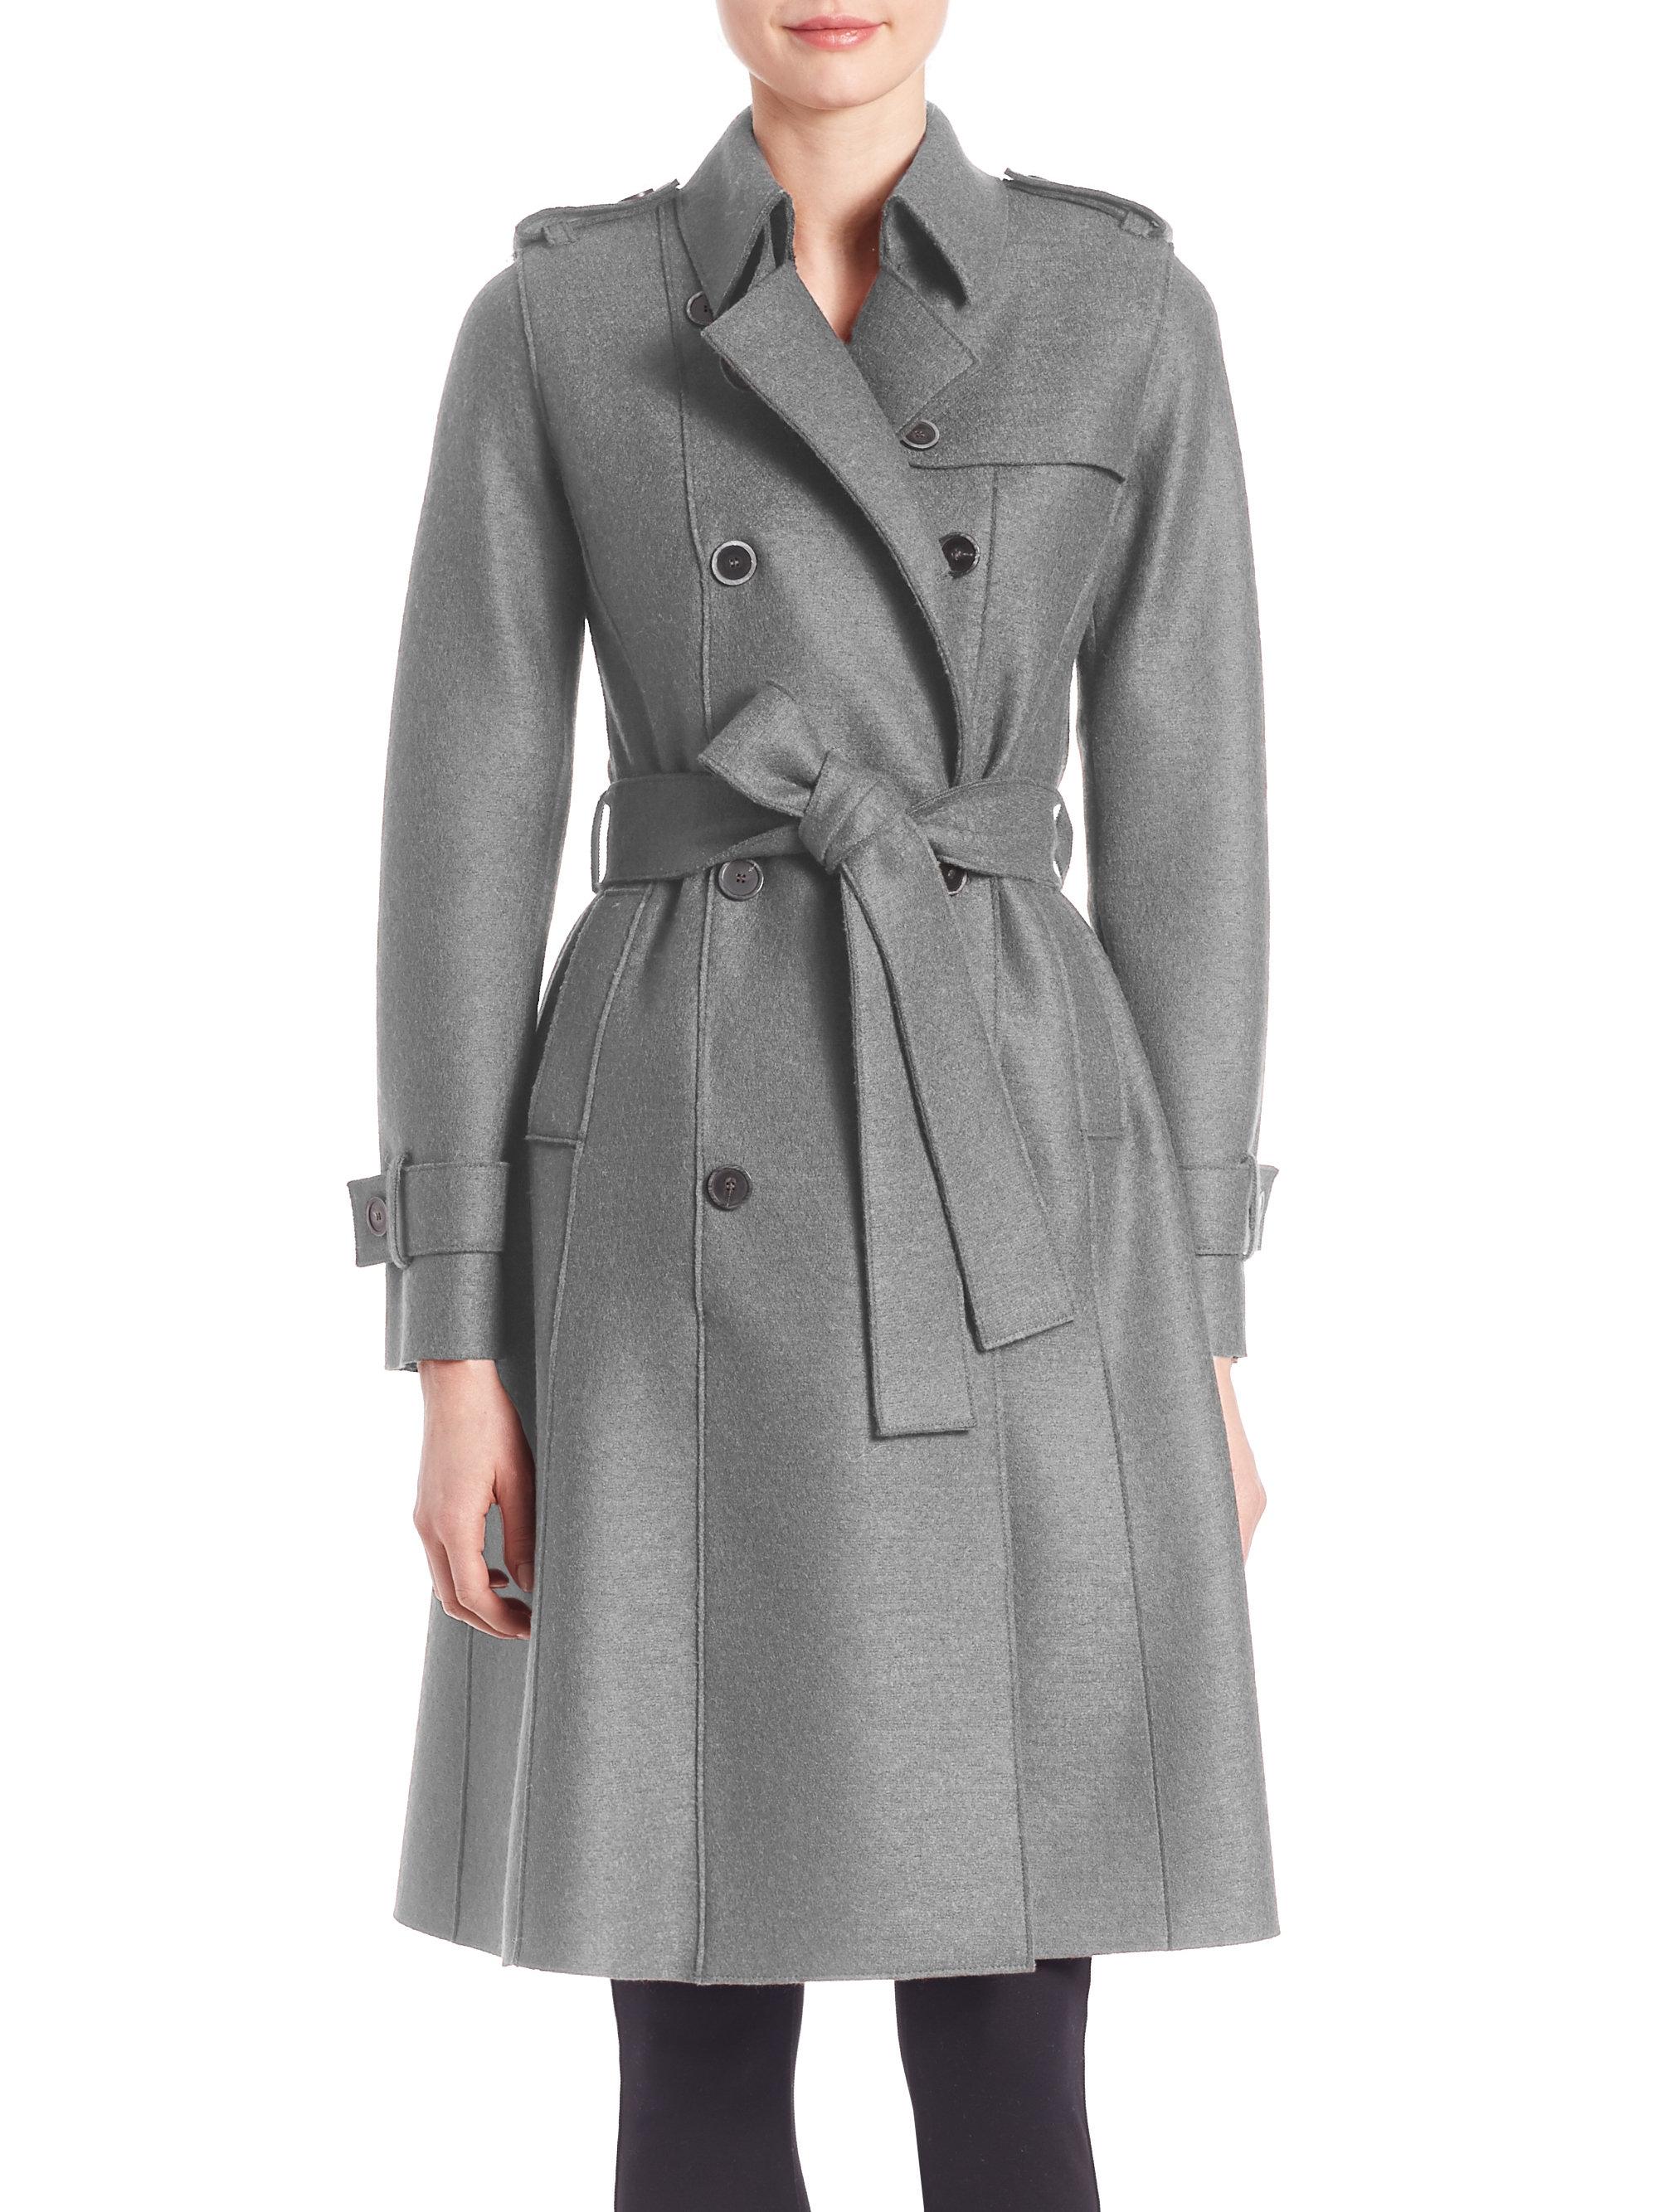 Lyst - Harris Wharf London Virgin Wool Trench Coat in Gray 37212d19348bb